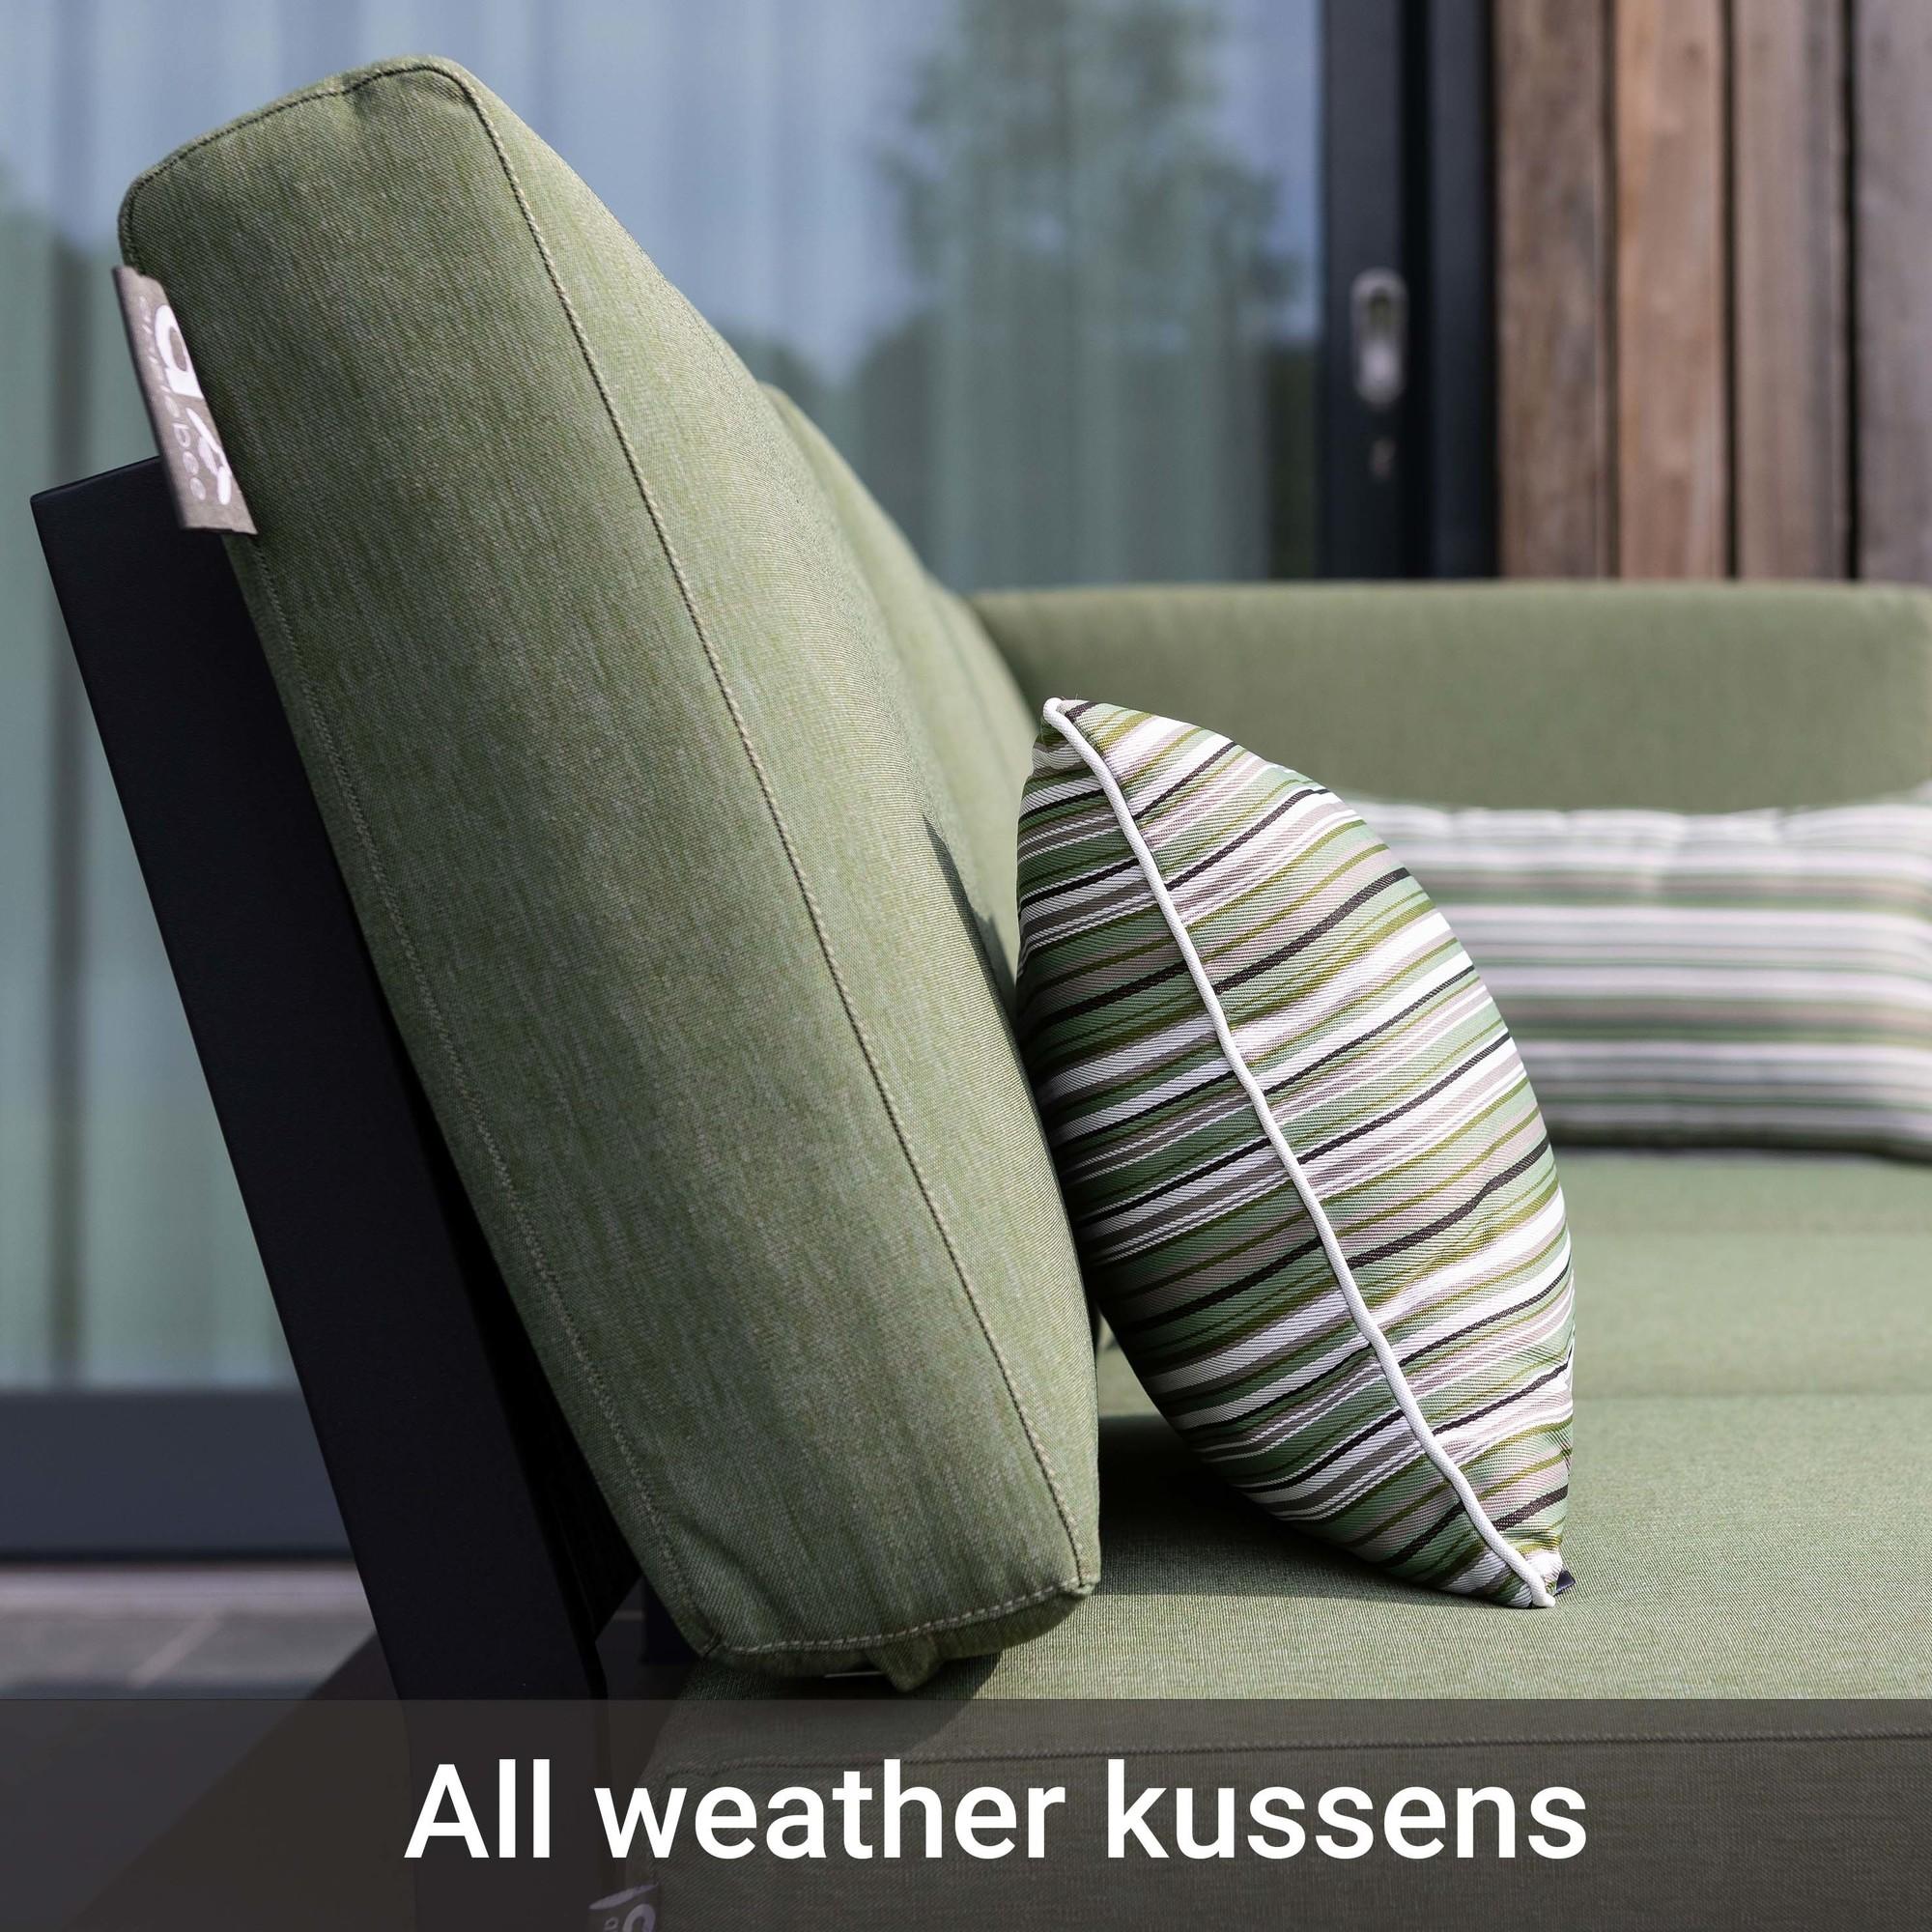 All Weather Kussens - Applebee